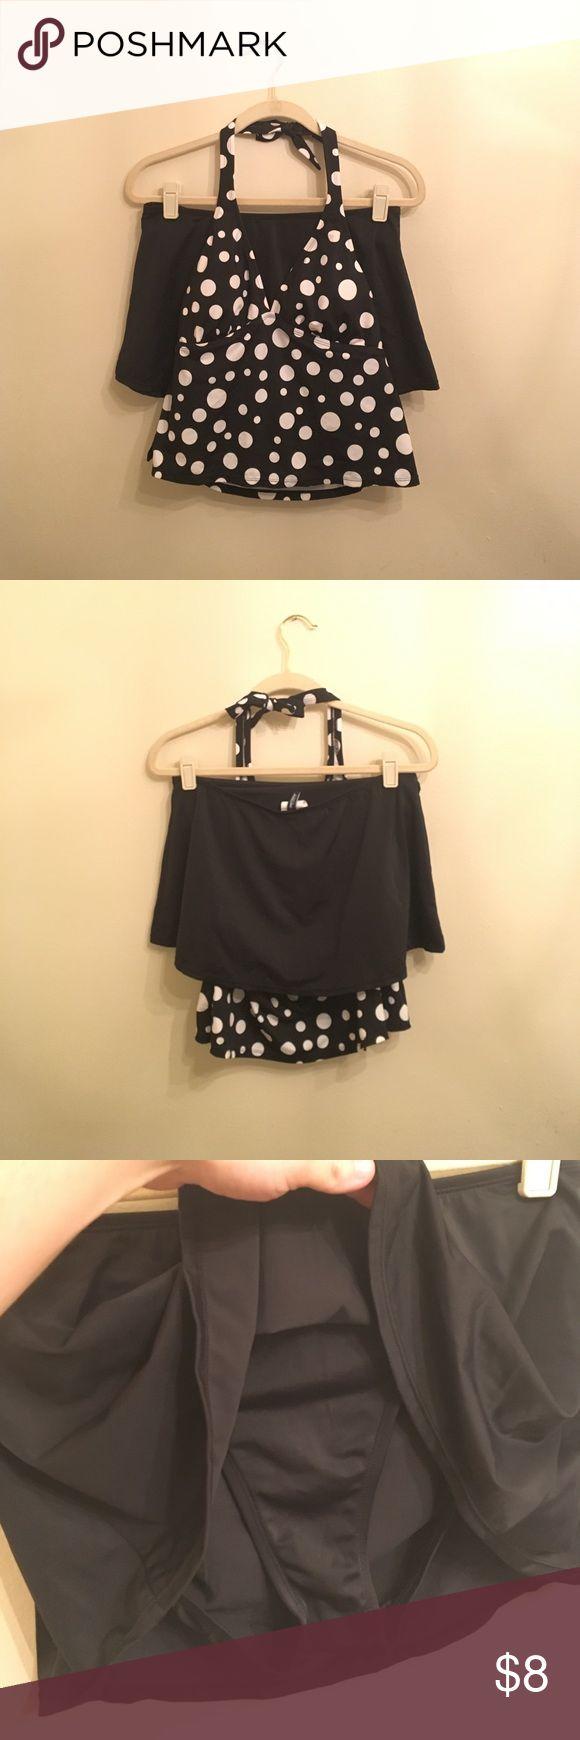 🦋$8🦋 💥NEW💥 Polka Dot Tankini Swim Suit Price firm unless bundled.  Reasonable bundle offers welcome. Swim Bikinis